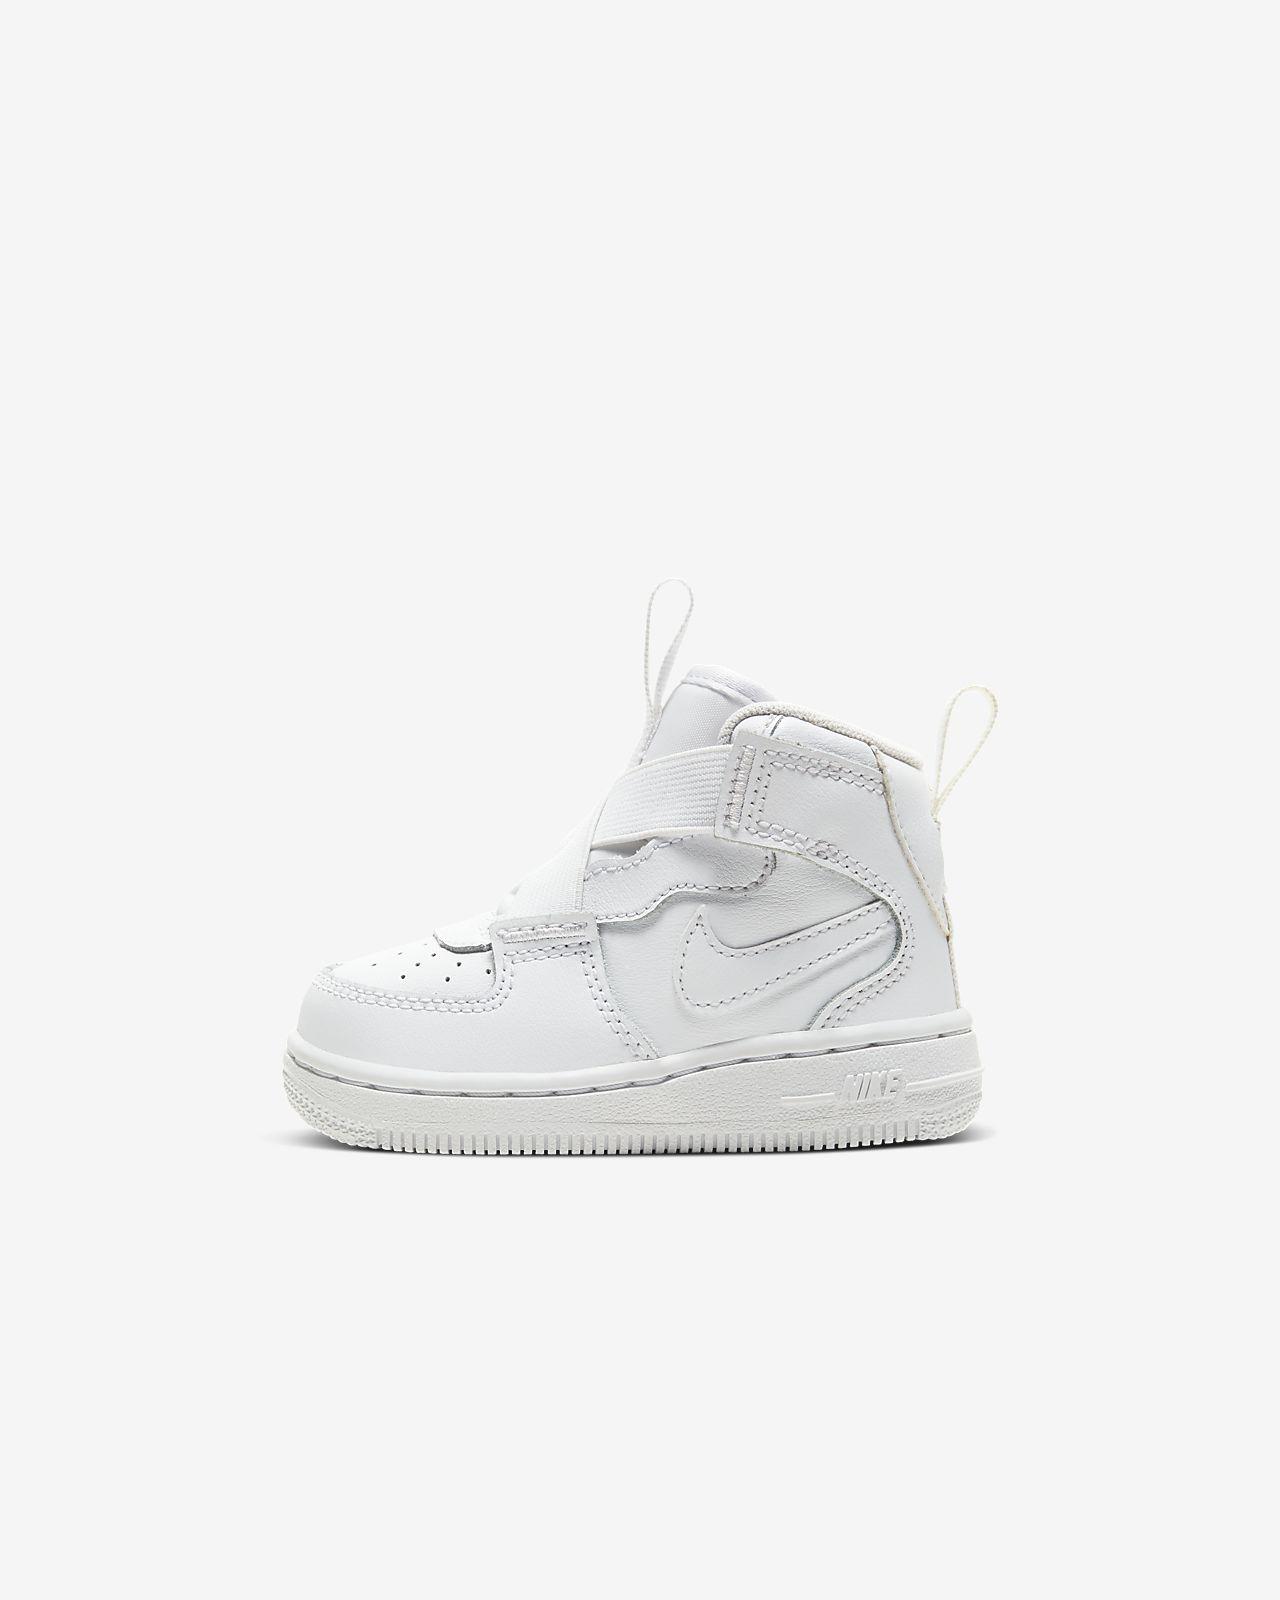 Nike Force 1 Low cipő babáknak. Nike HU